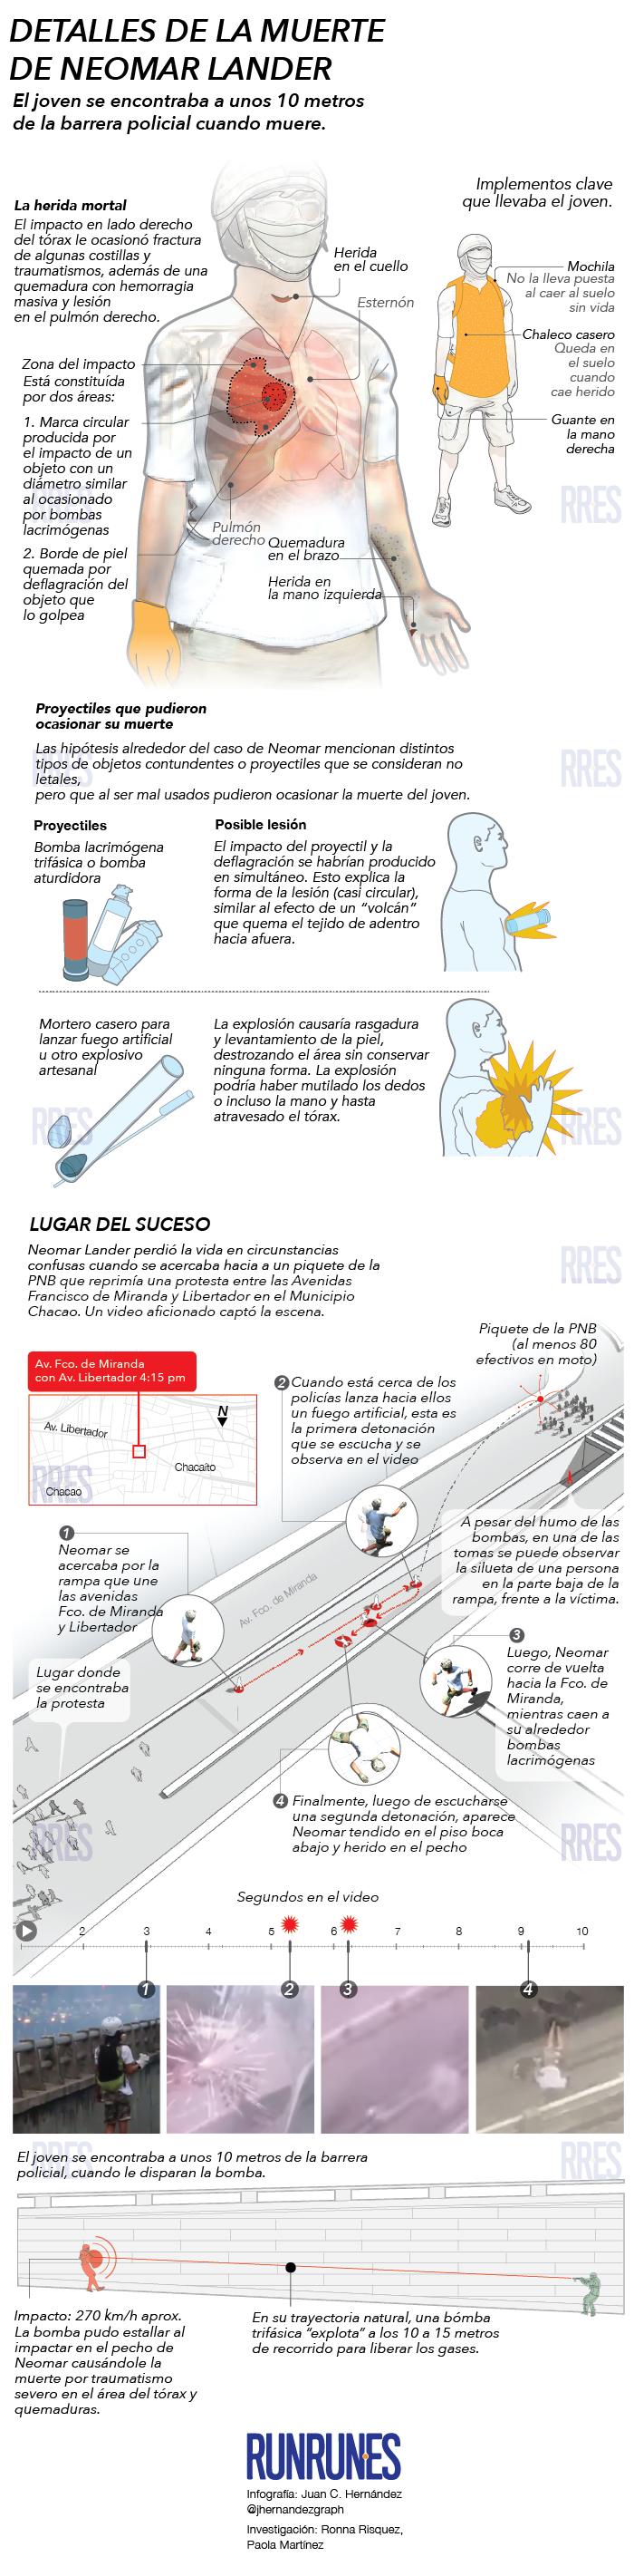 Infografía Muerte Neomar